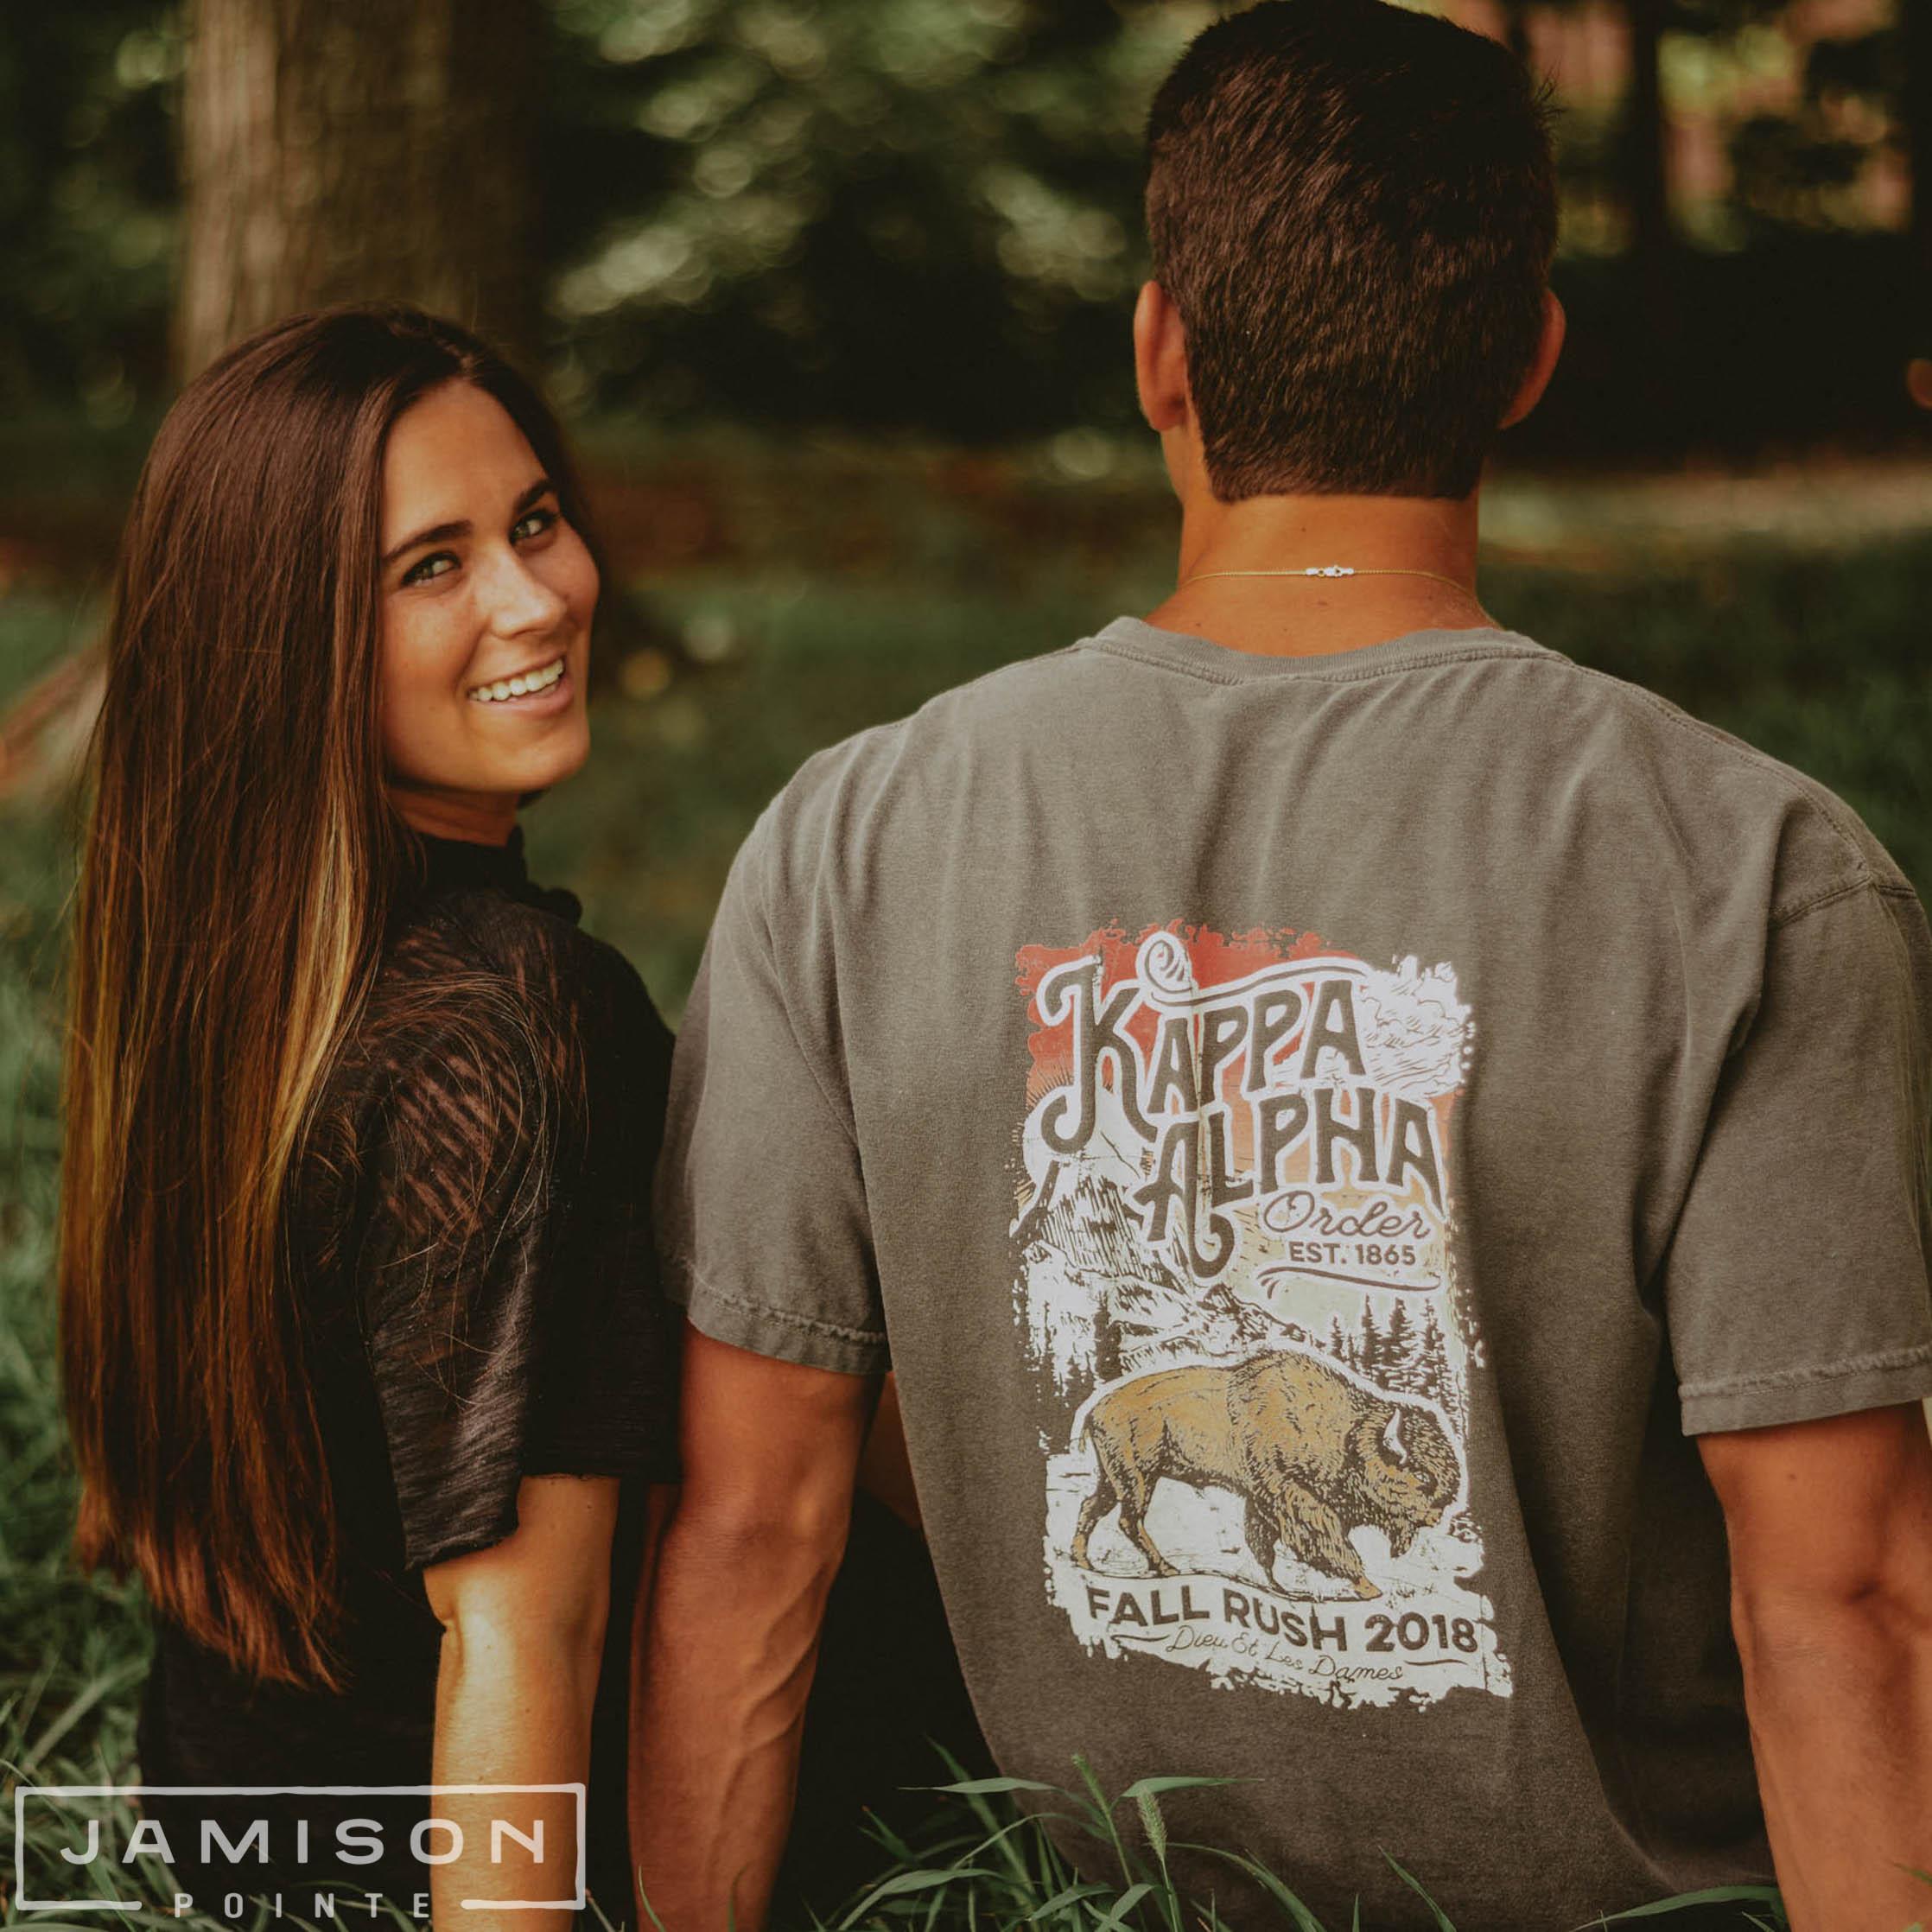 Kappa Alpha Buffalo Fall Rush Tee